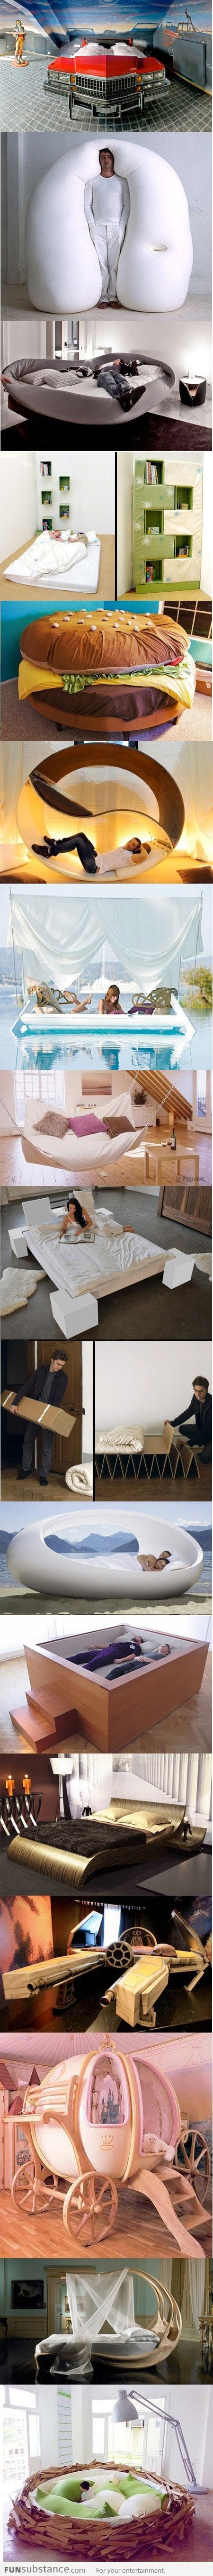 17 Creative Bed Designs